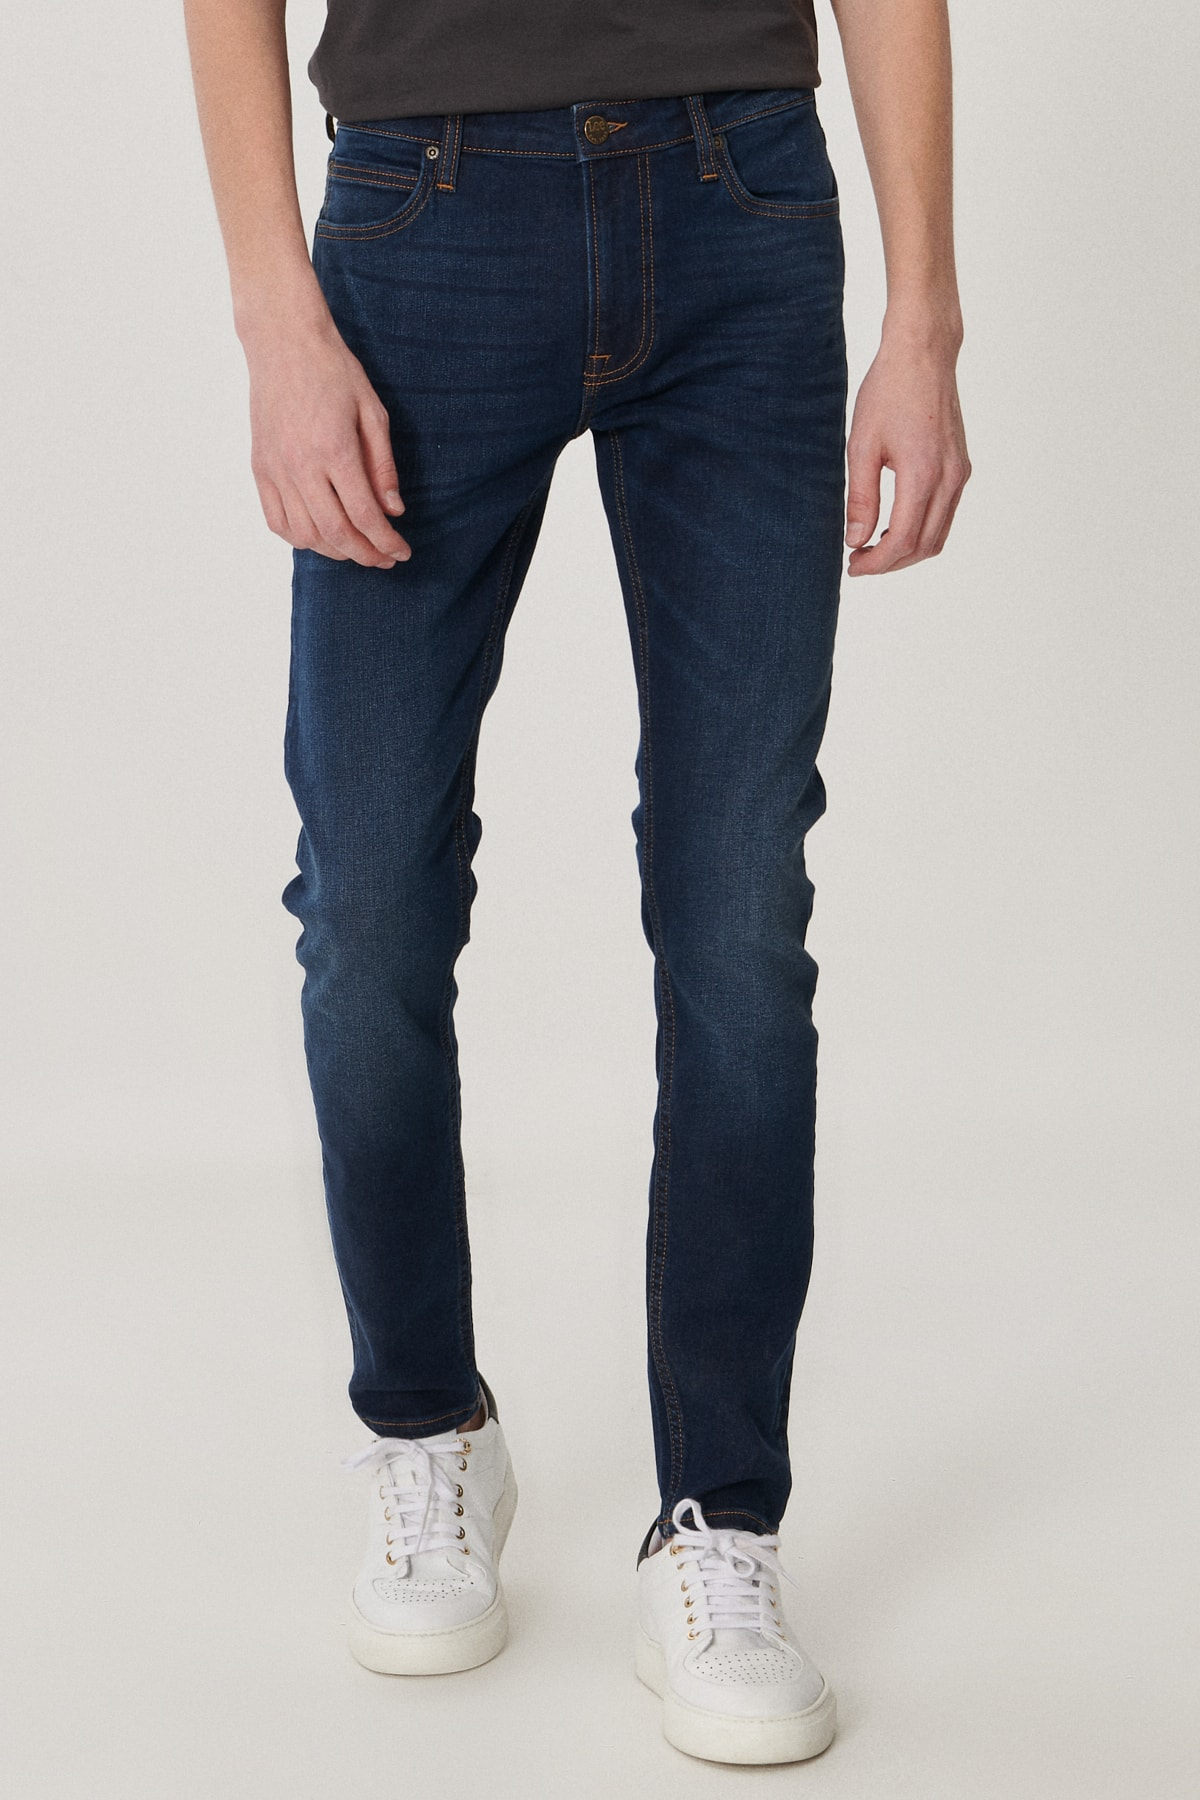 Lee Malone Erkek Koyu Mavİ Skinny Normal Bel Çok Dar Paça Esnek Jean Pantolon